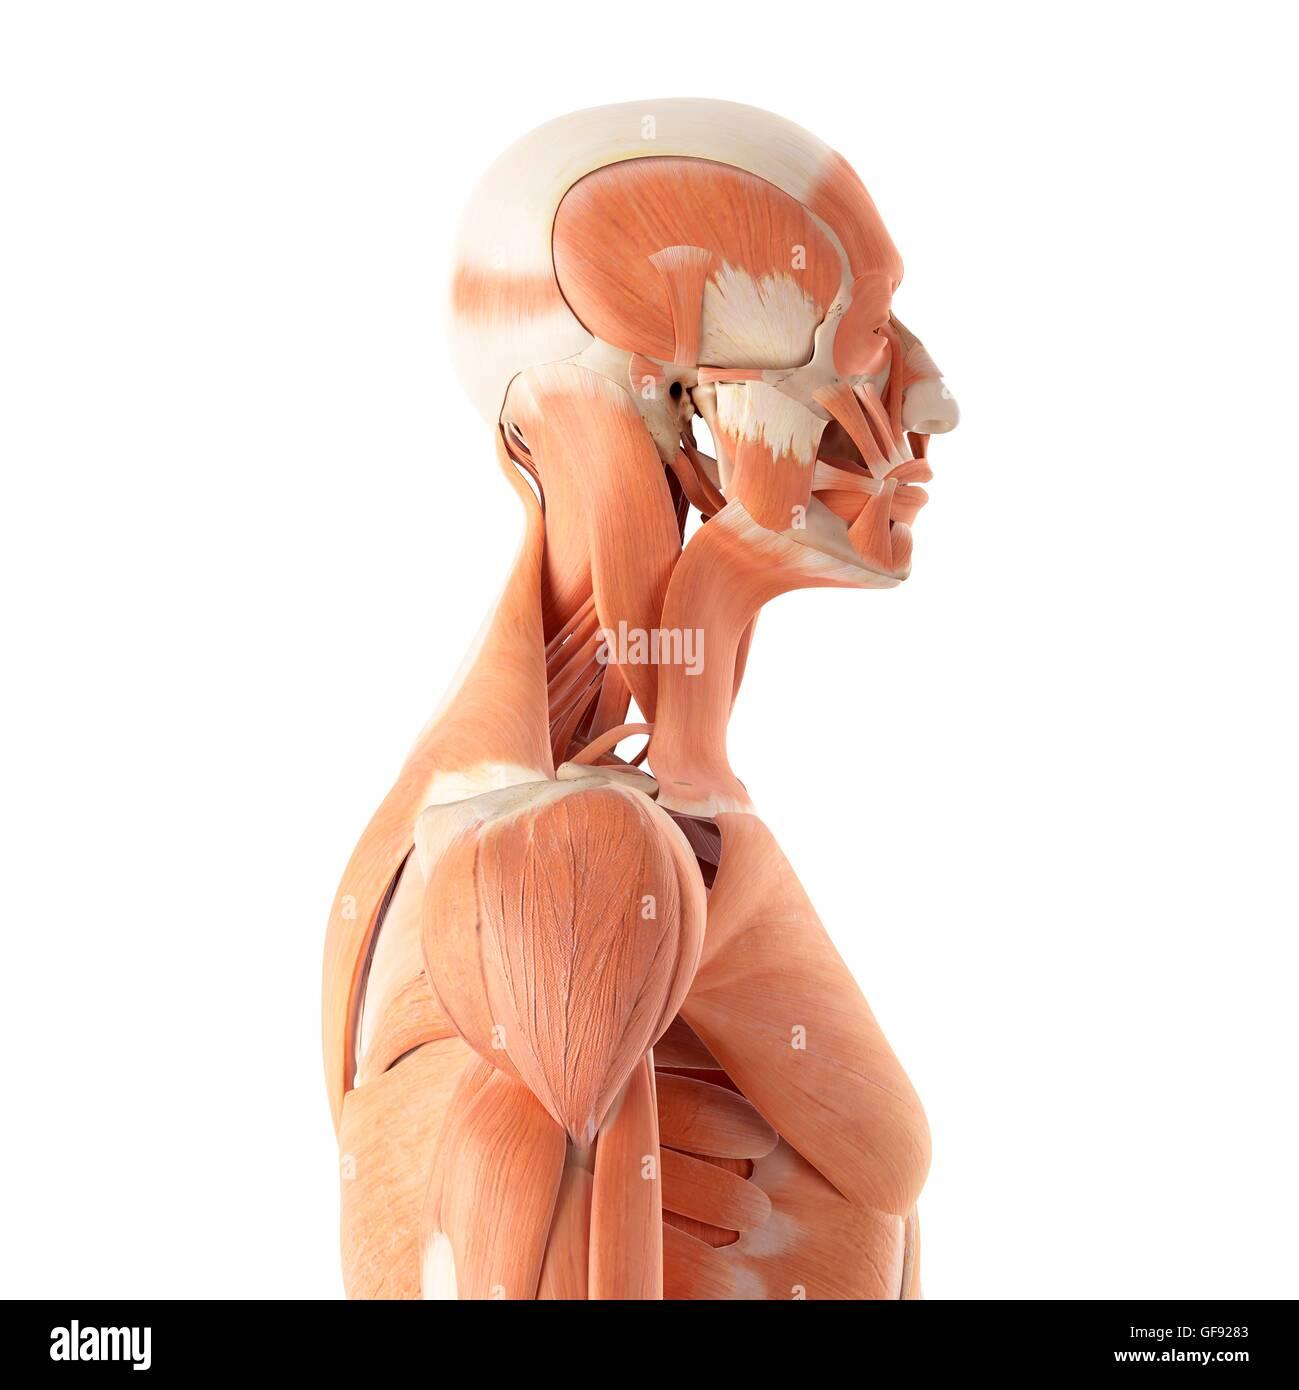 Human muscular system, illustration. - Stock Image